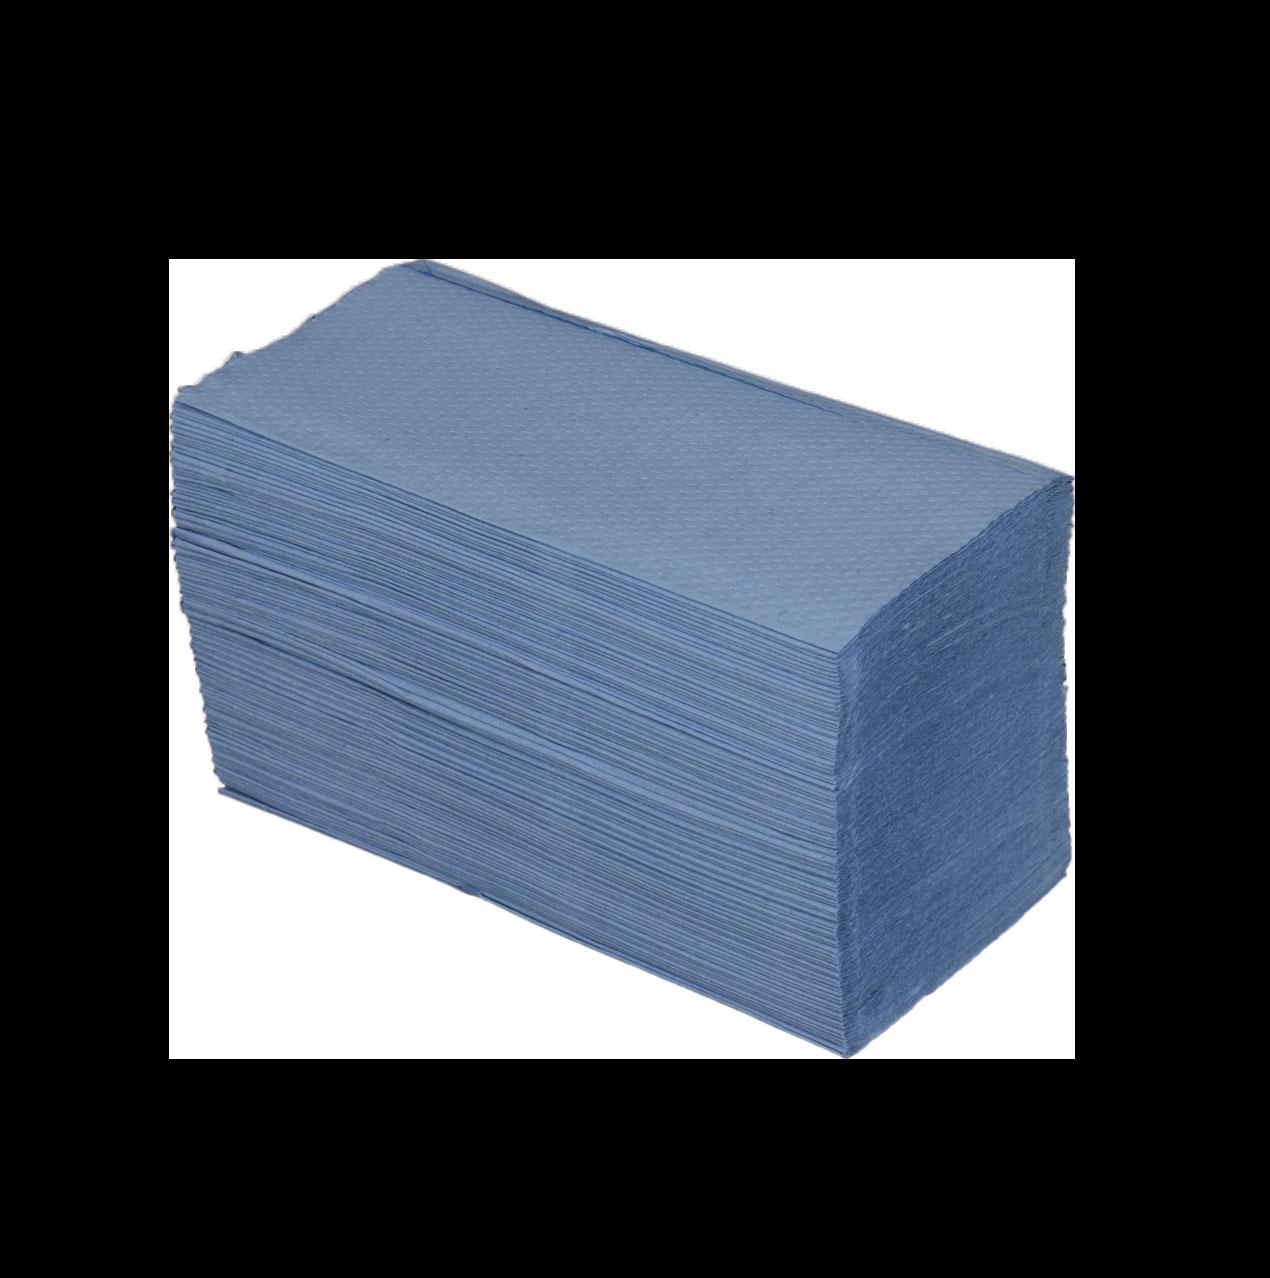 HANDTOWEL - Blue Nfold 32x22cm (cel.2p)